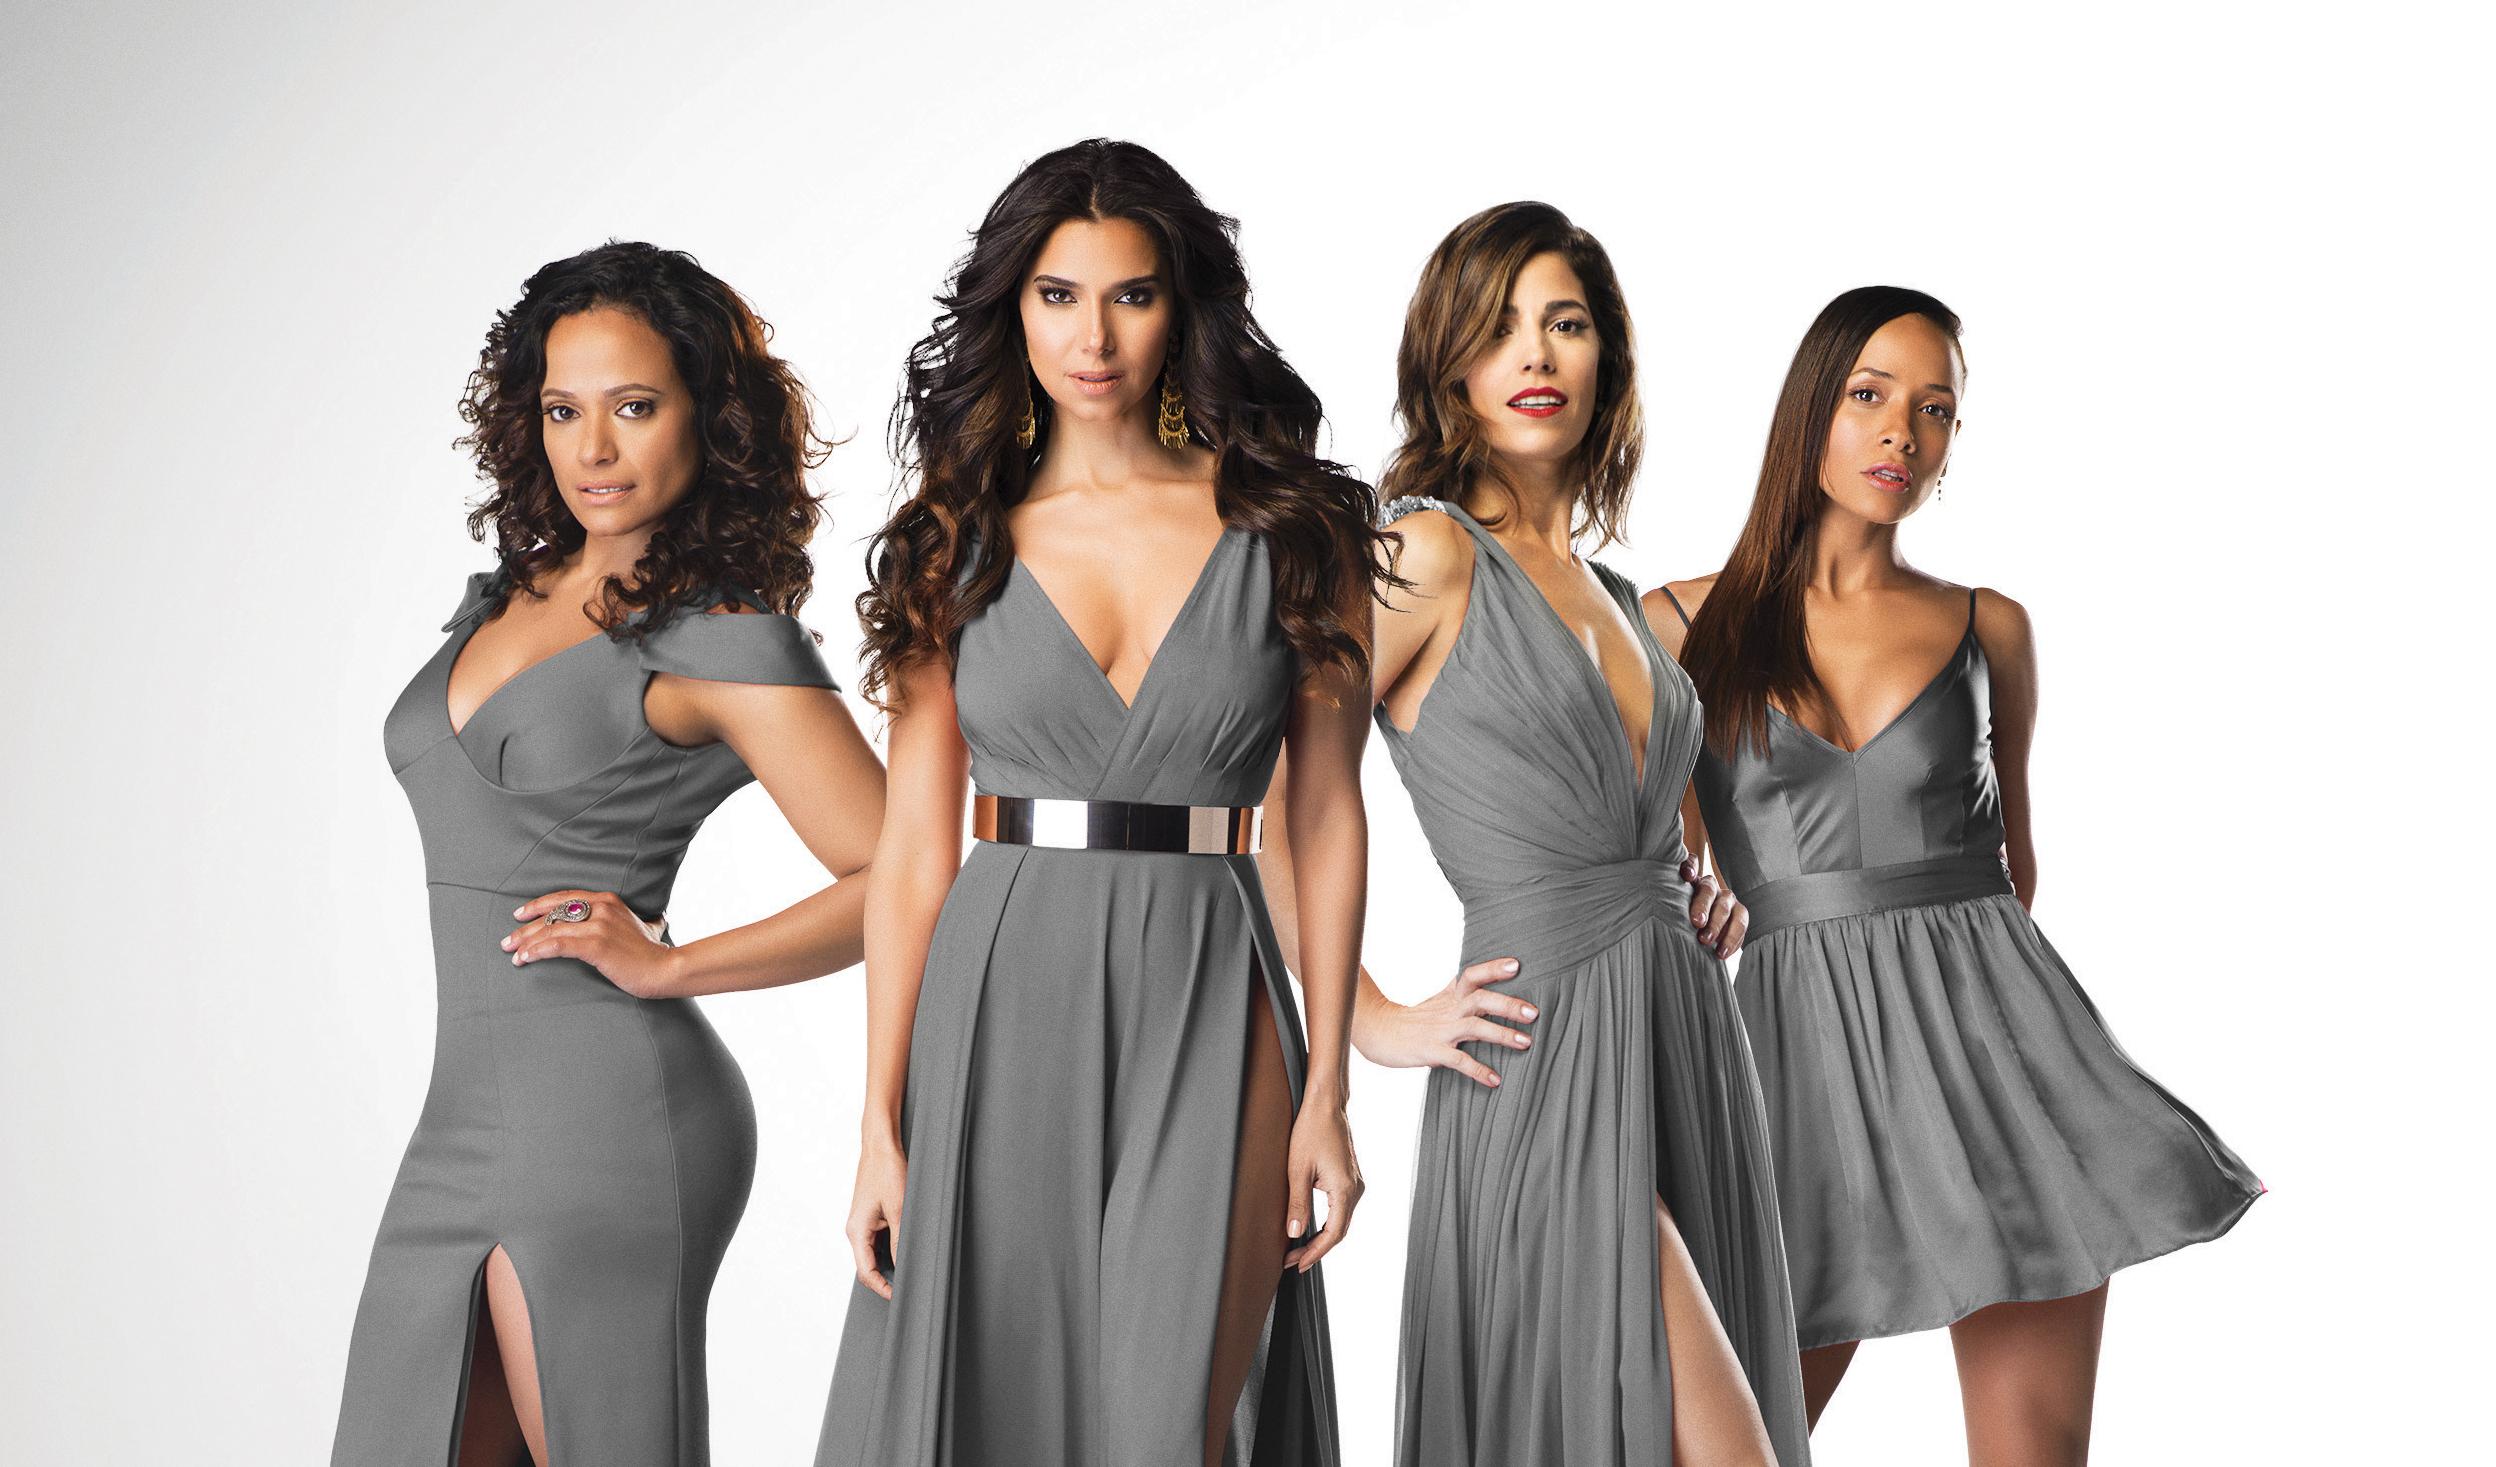 Devious Maids season finale